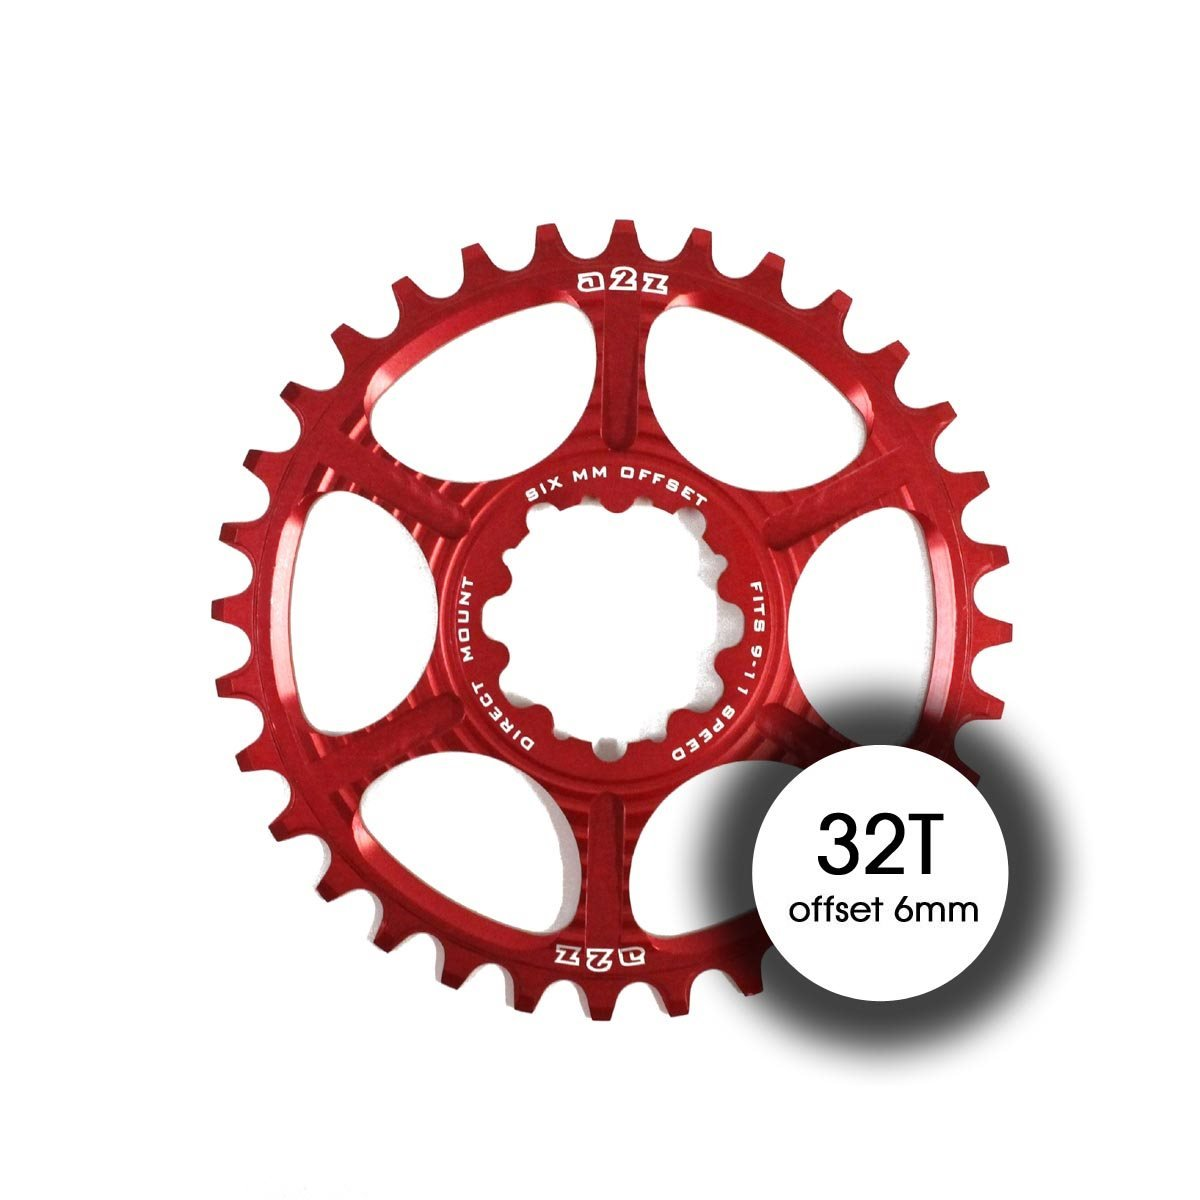 A2Z Corona Direct Mount 32T Offset 6mm 9–11vel Rojo (monocorone)/Chainring Direct Mount 32T Offset 6mm 9–11sp Red (narrow-wide)